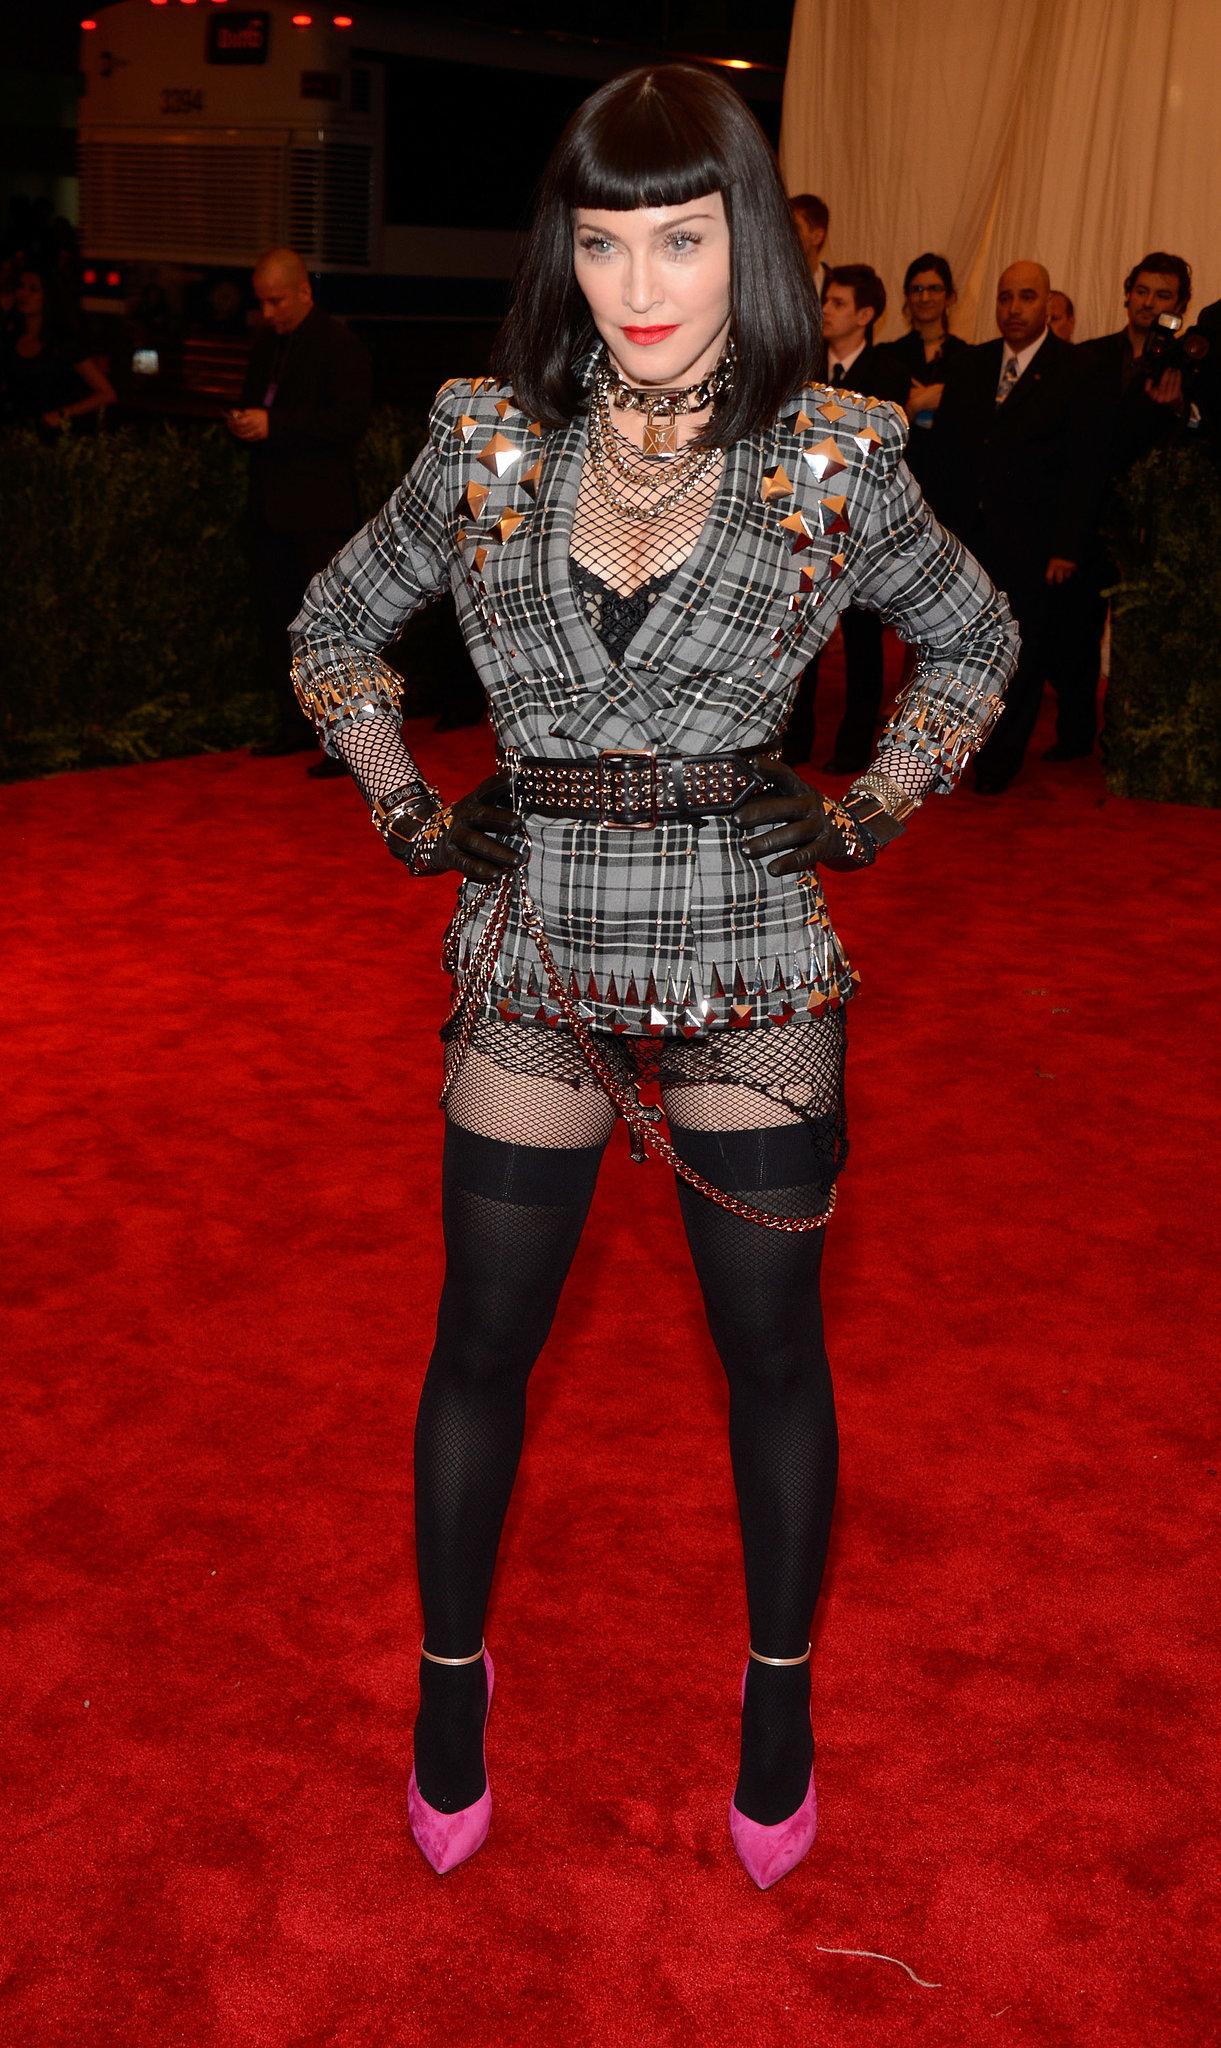 Madonna at the 2013 Met Gala